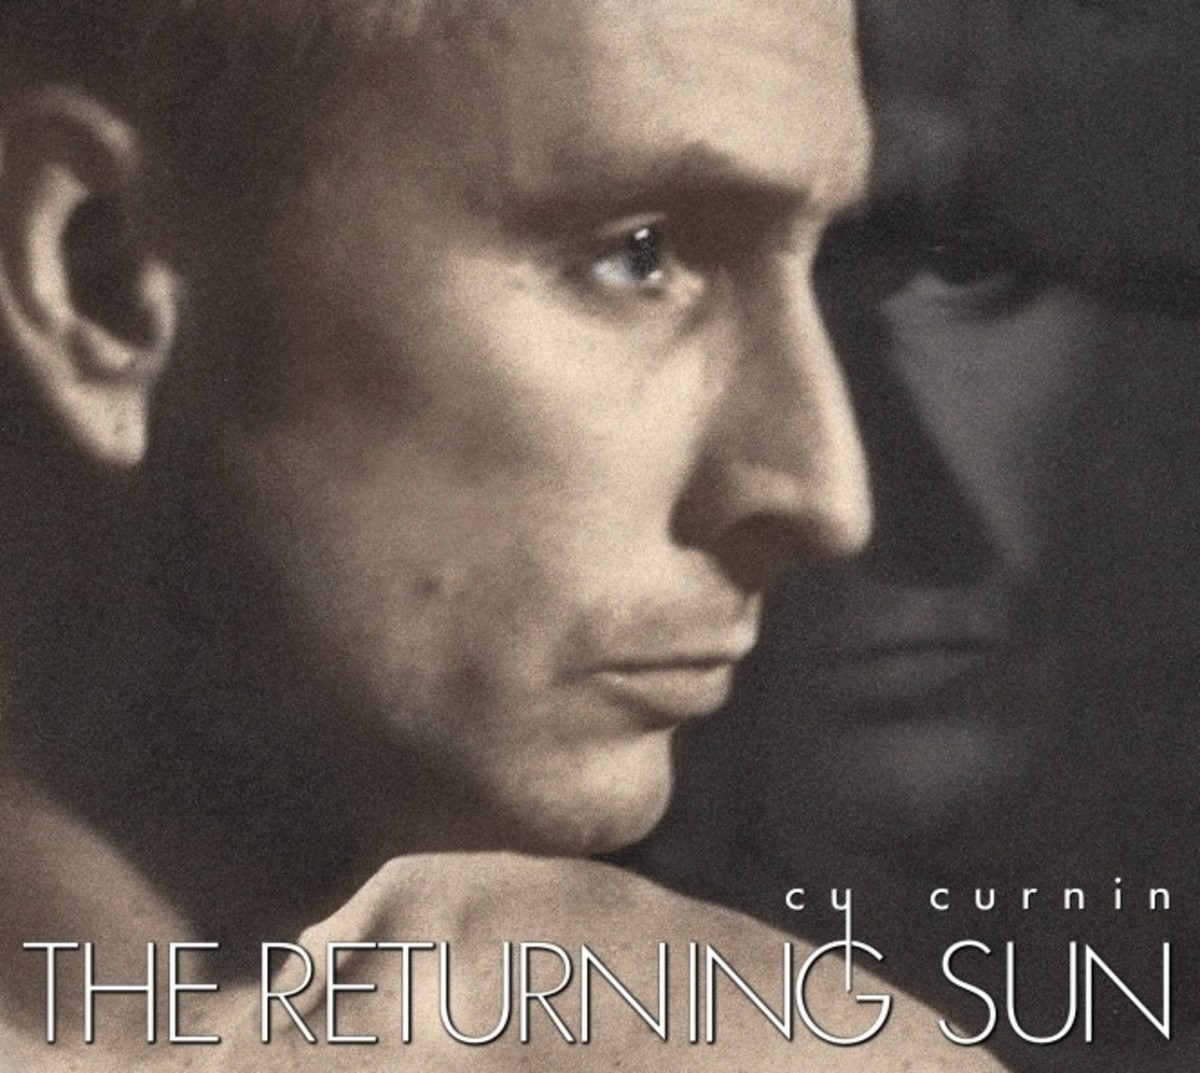 Cy_Curnin_The_Returning_Sun.jpg